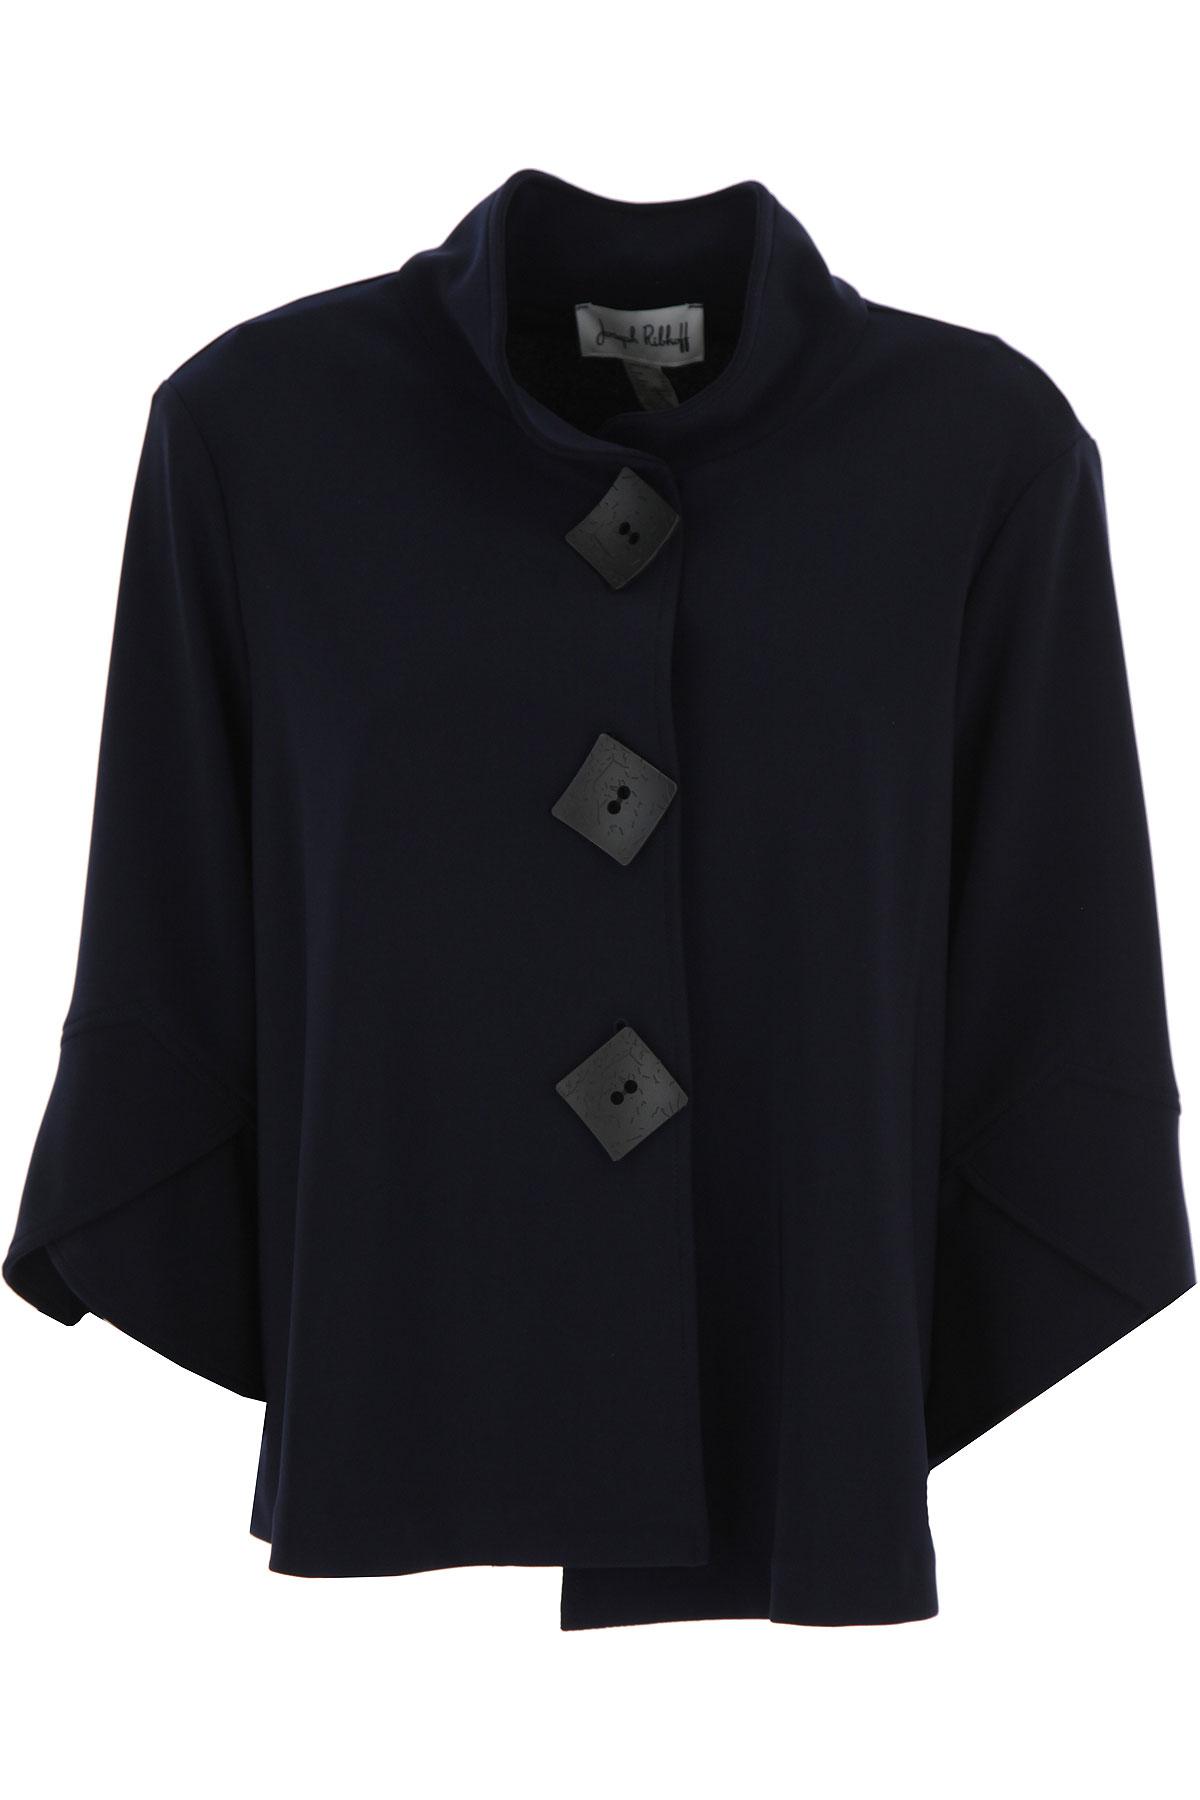 Joseph Ribkoff Jacket for Women On Sale, Midnight Blue, polyester, 2019, 14 8